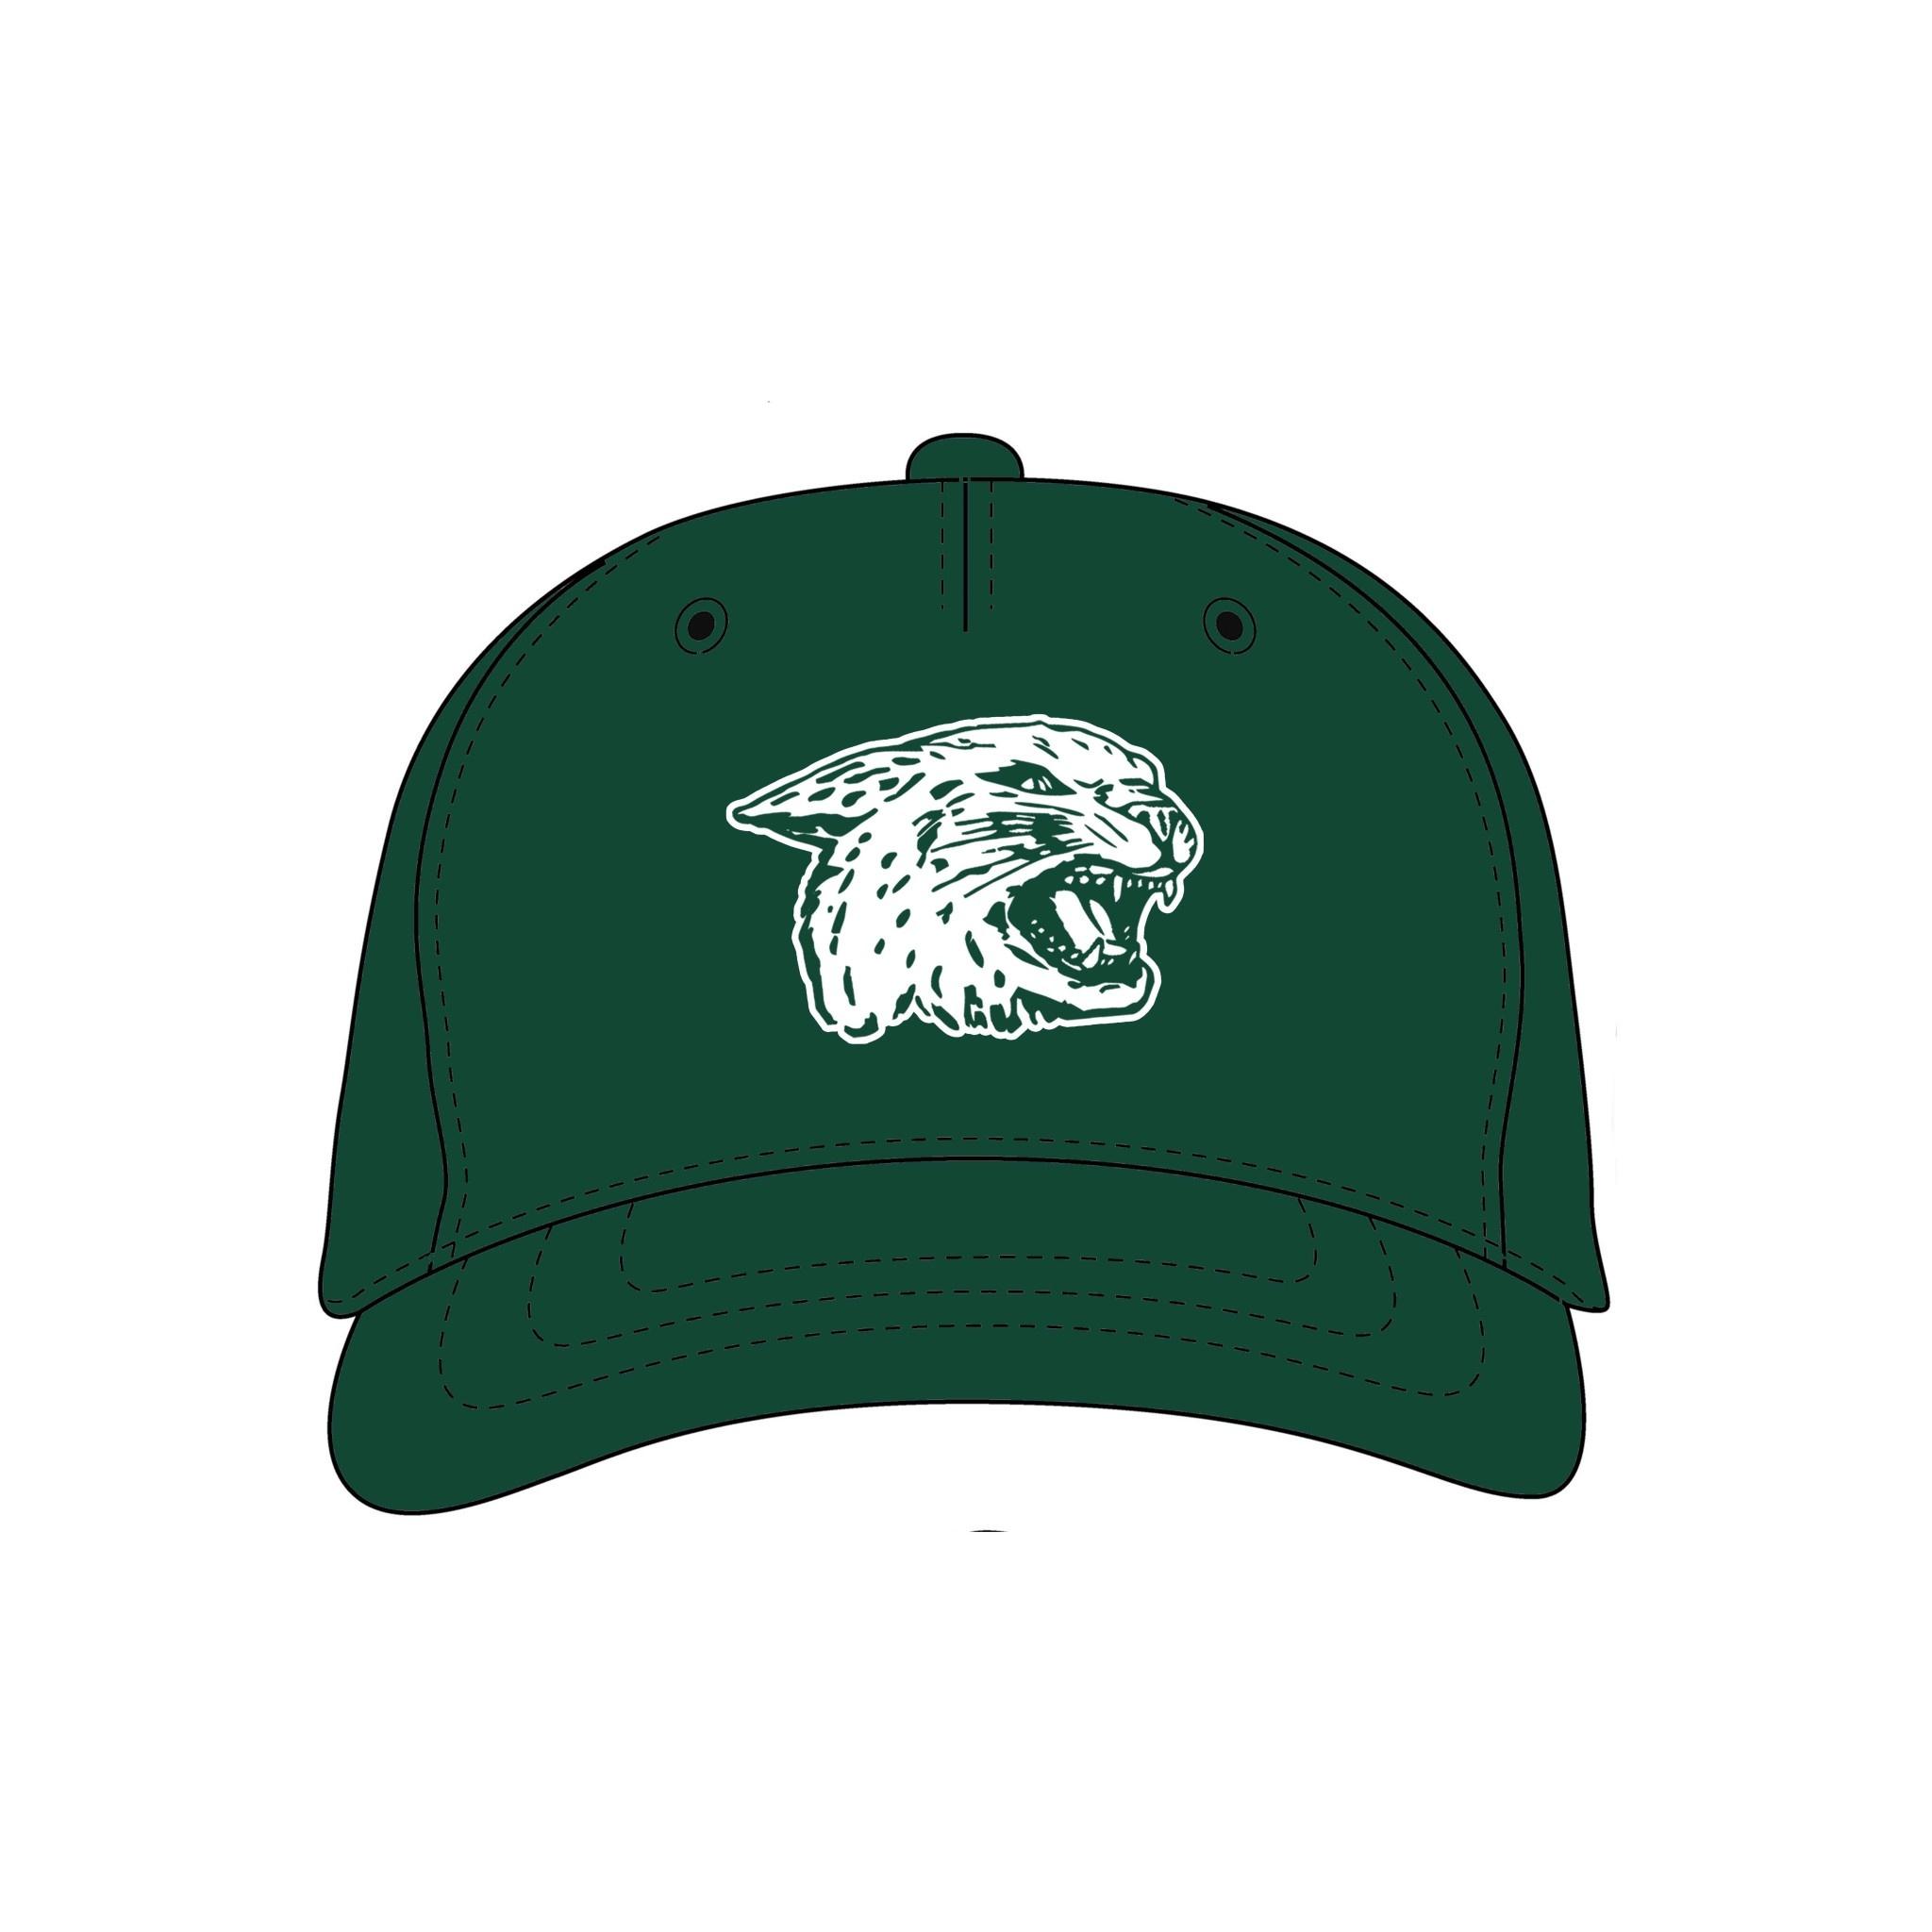 Hat: Classic Legacy - Green